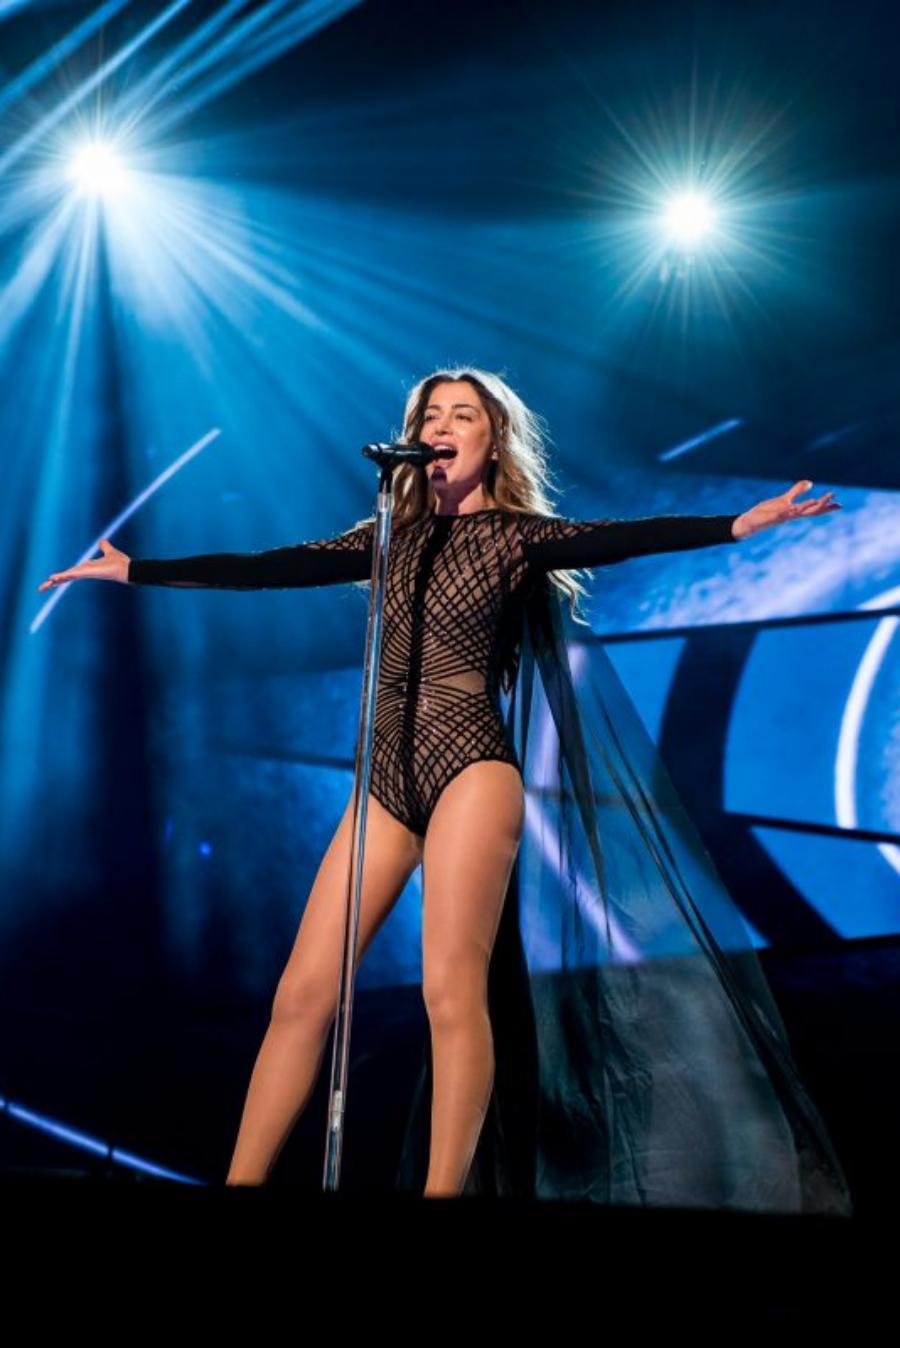 Eurovision Song Contest 2016: Armenia